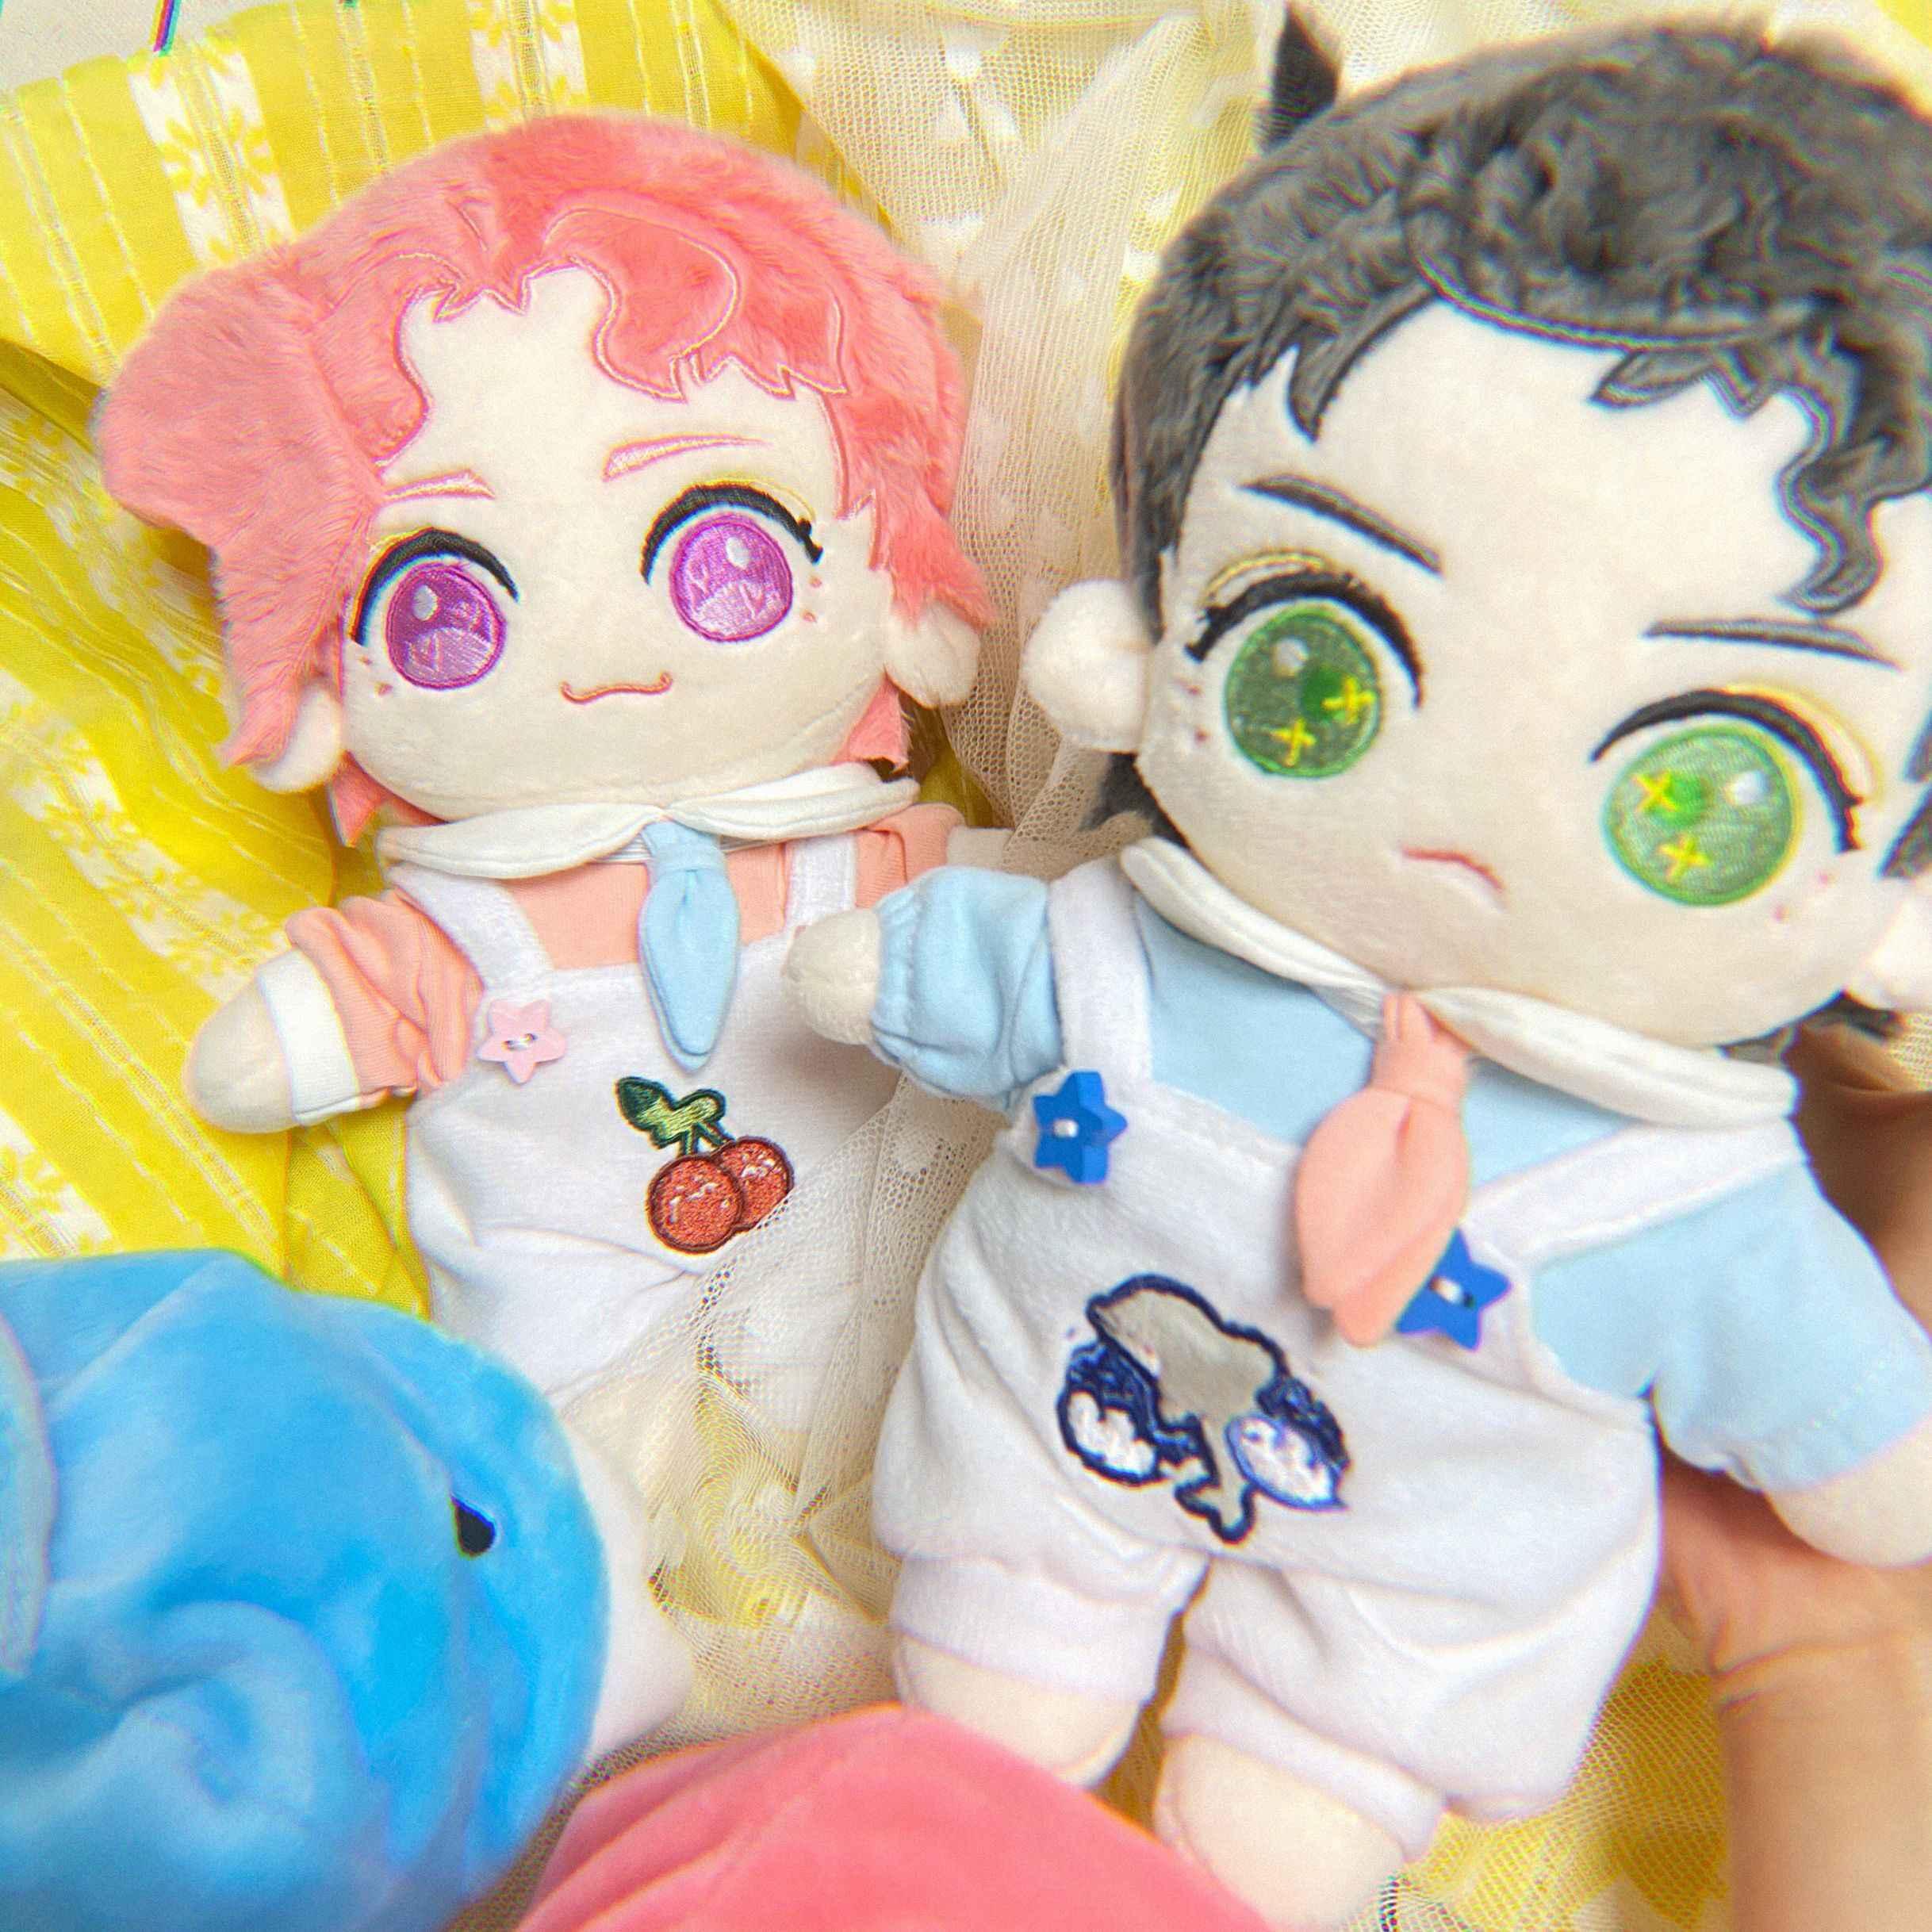 JoJo/'s Bizarre Adventure Kujo Jotaro Cosplay DIY Change Plush Dolls Plushie 20cm